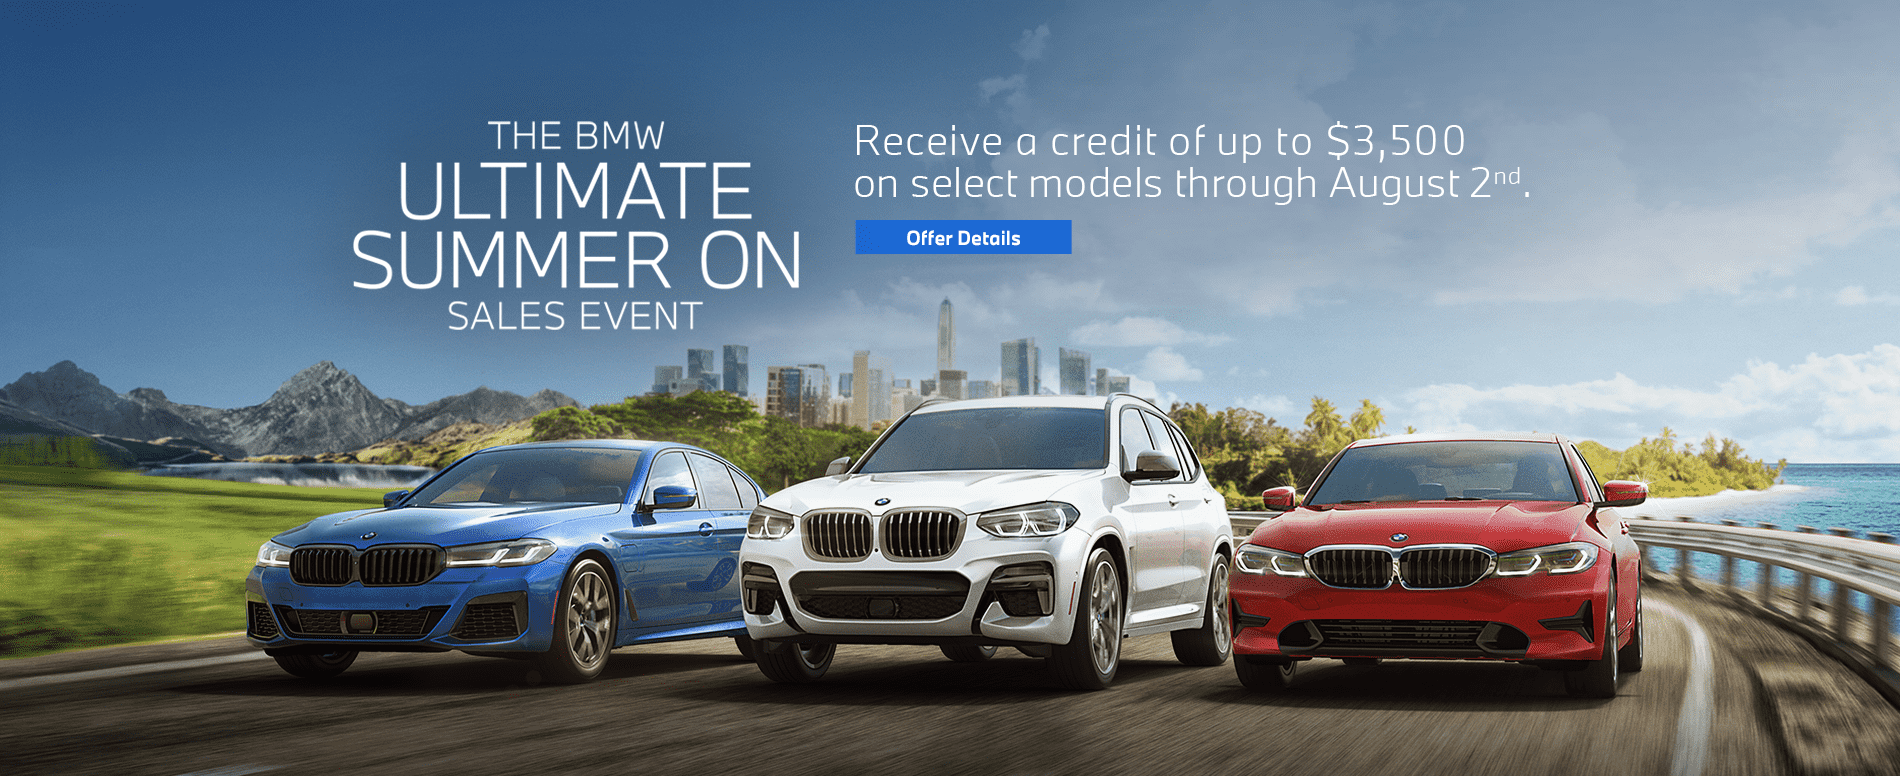 PUSH_BMW_Ultimate_Summer_On_2021_1900x776_Desktop